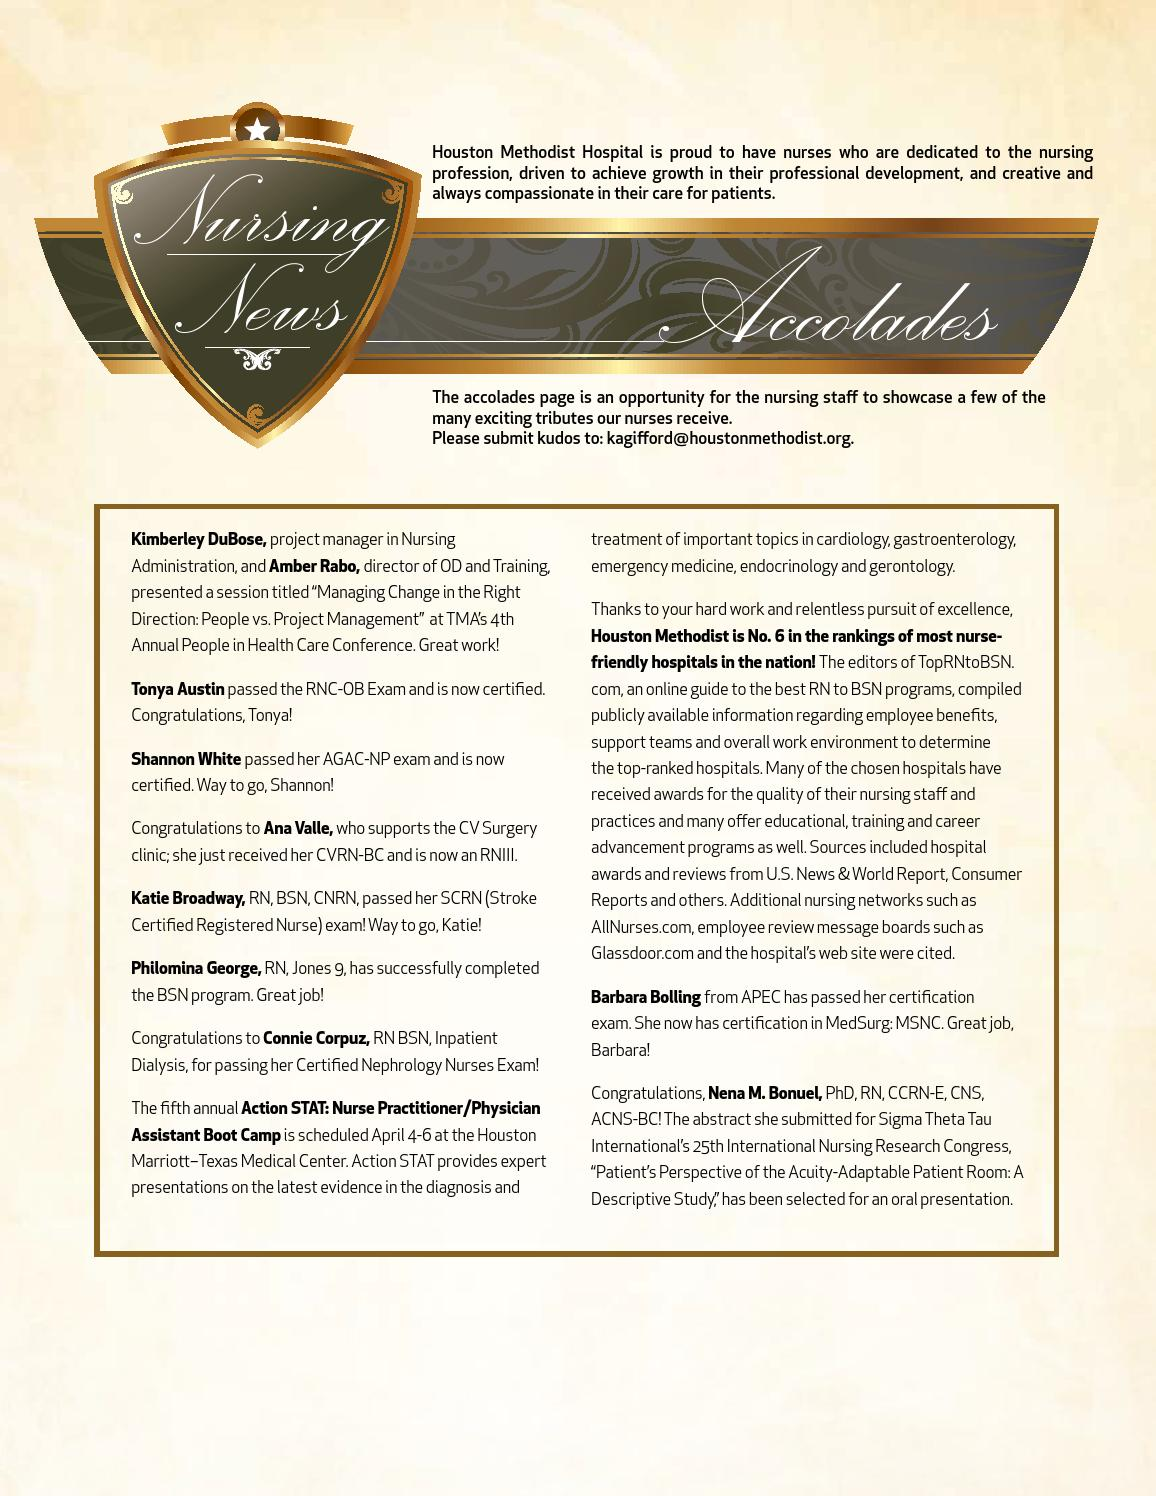 Houston Methodist Nurse March 2014 By Houston Methodist Professional